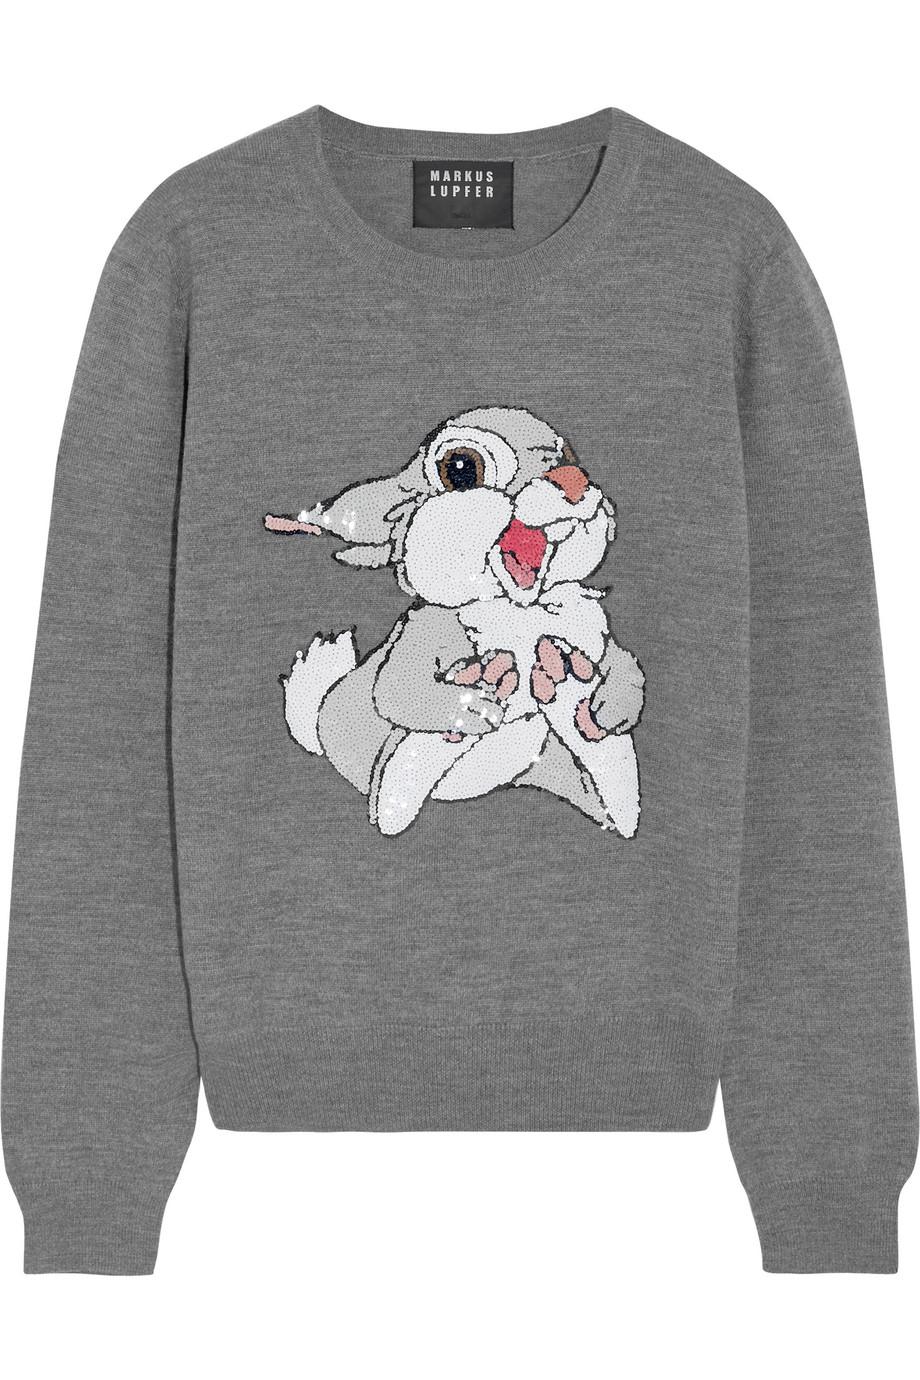 Markus Lupfer Thumper Sequin-Embellished Merino Wool Sweater, Gray, Women's